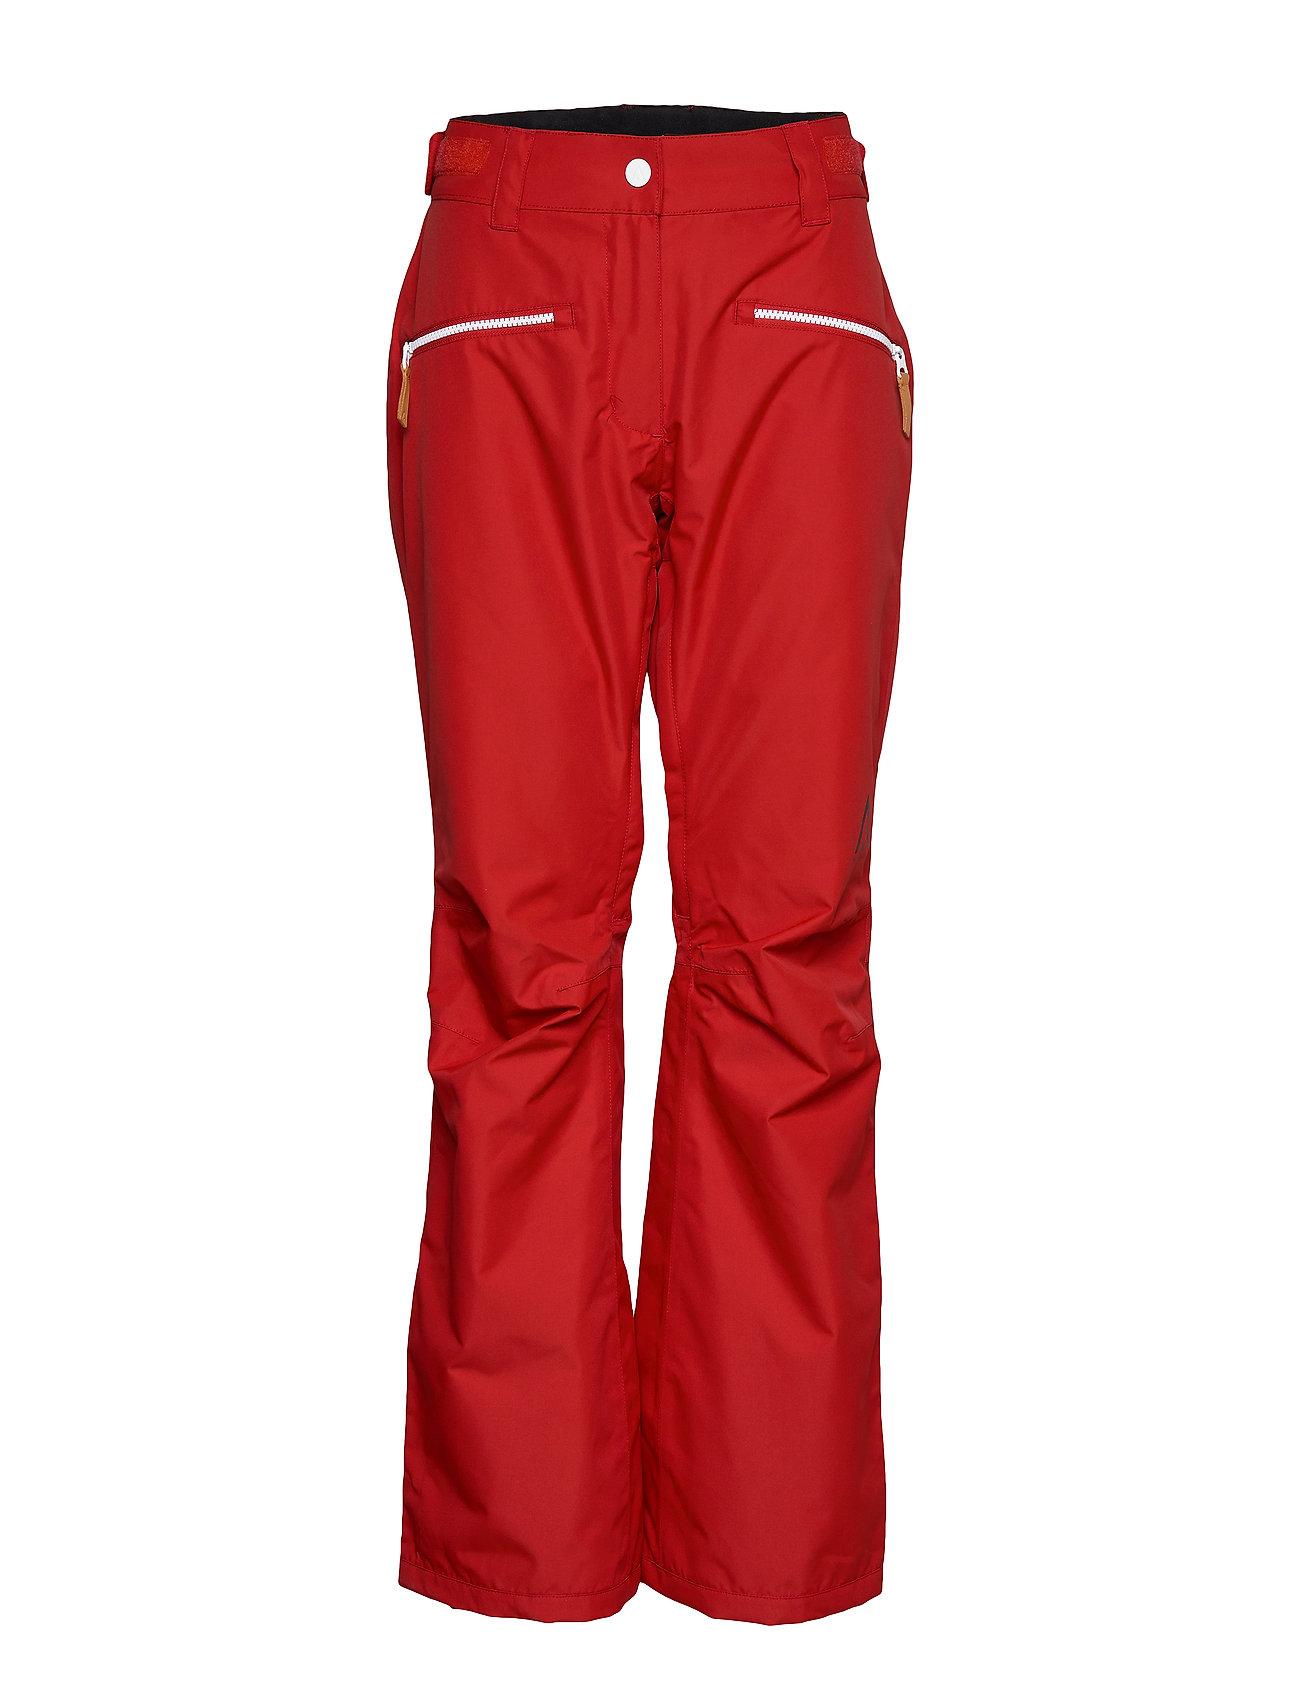 Image of Cork Pant Sport Pants Rød WearColour (3261451539)